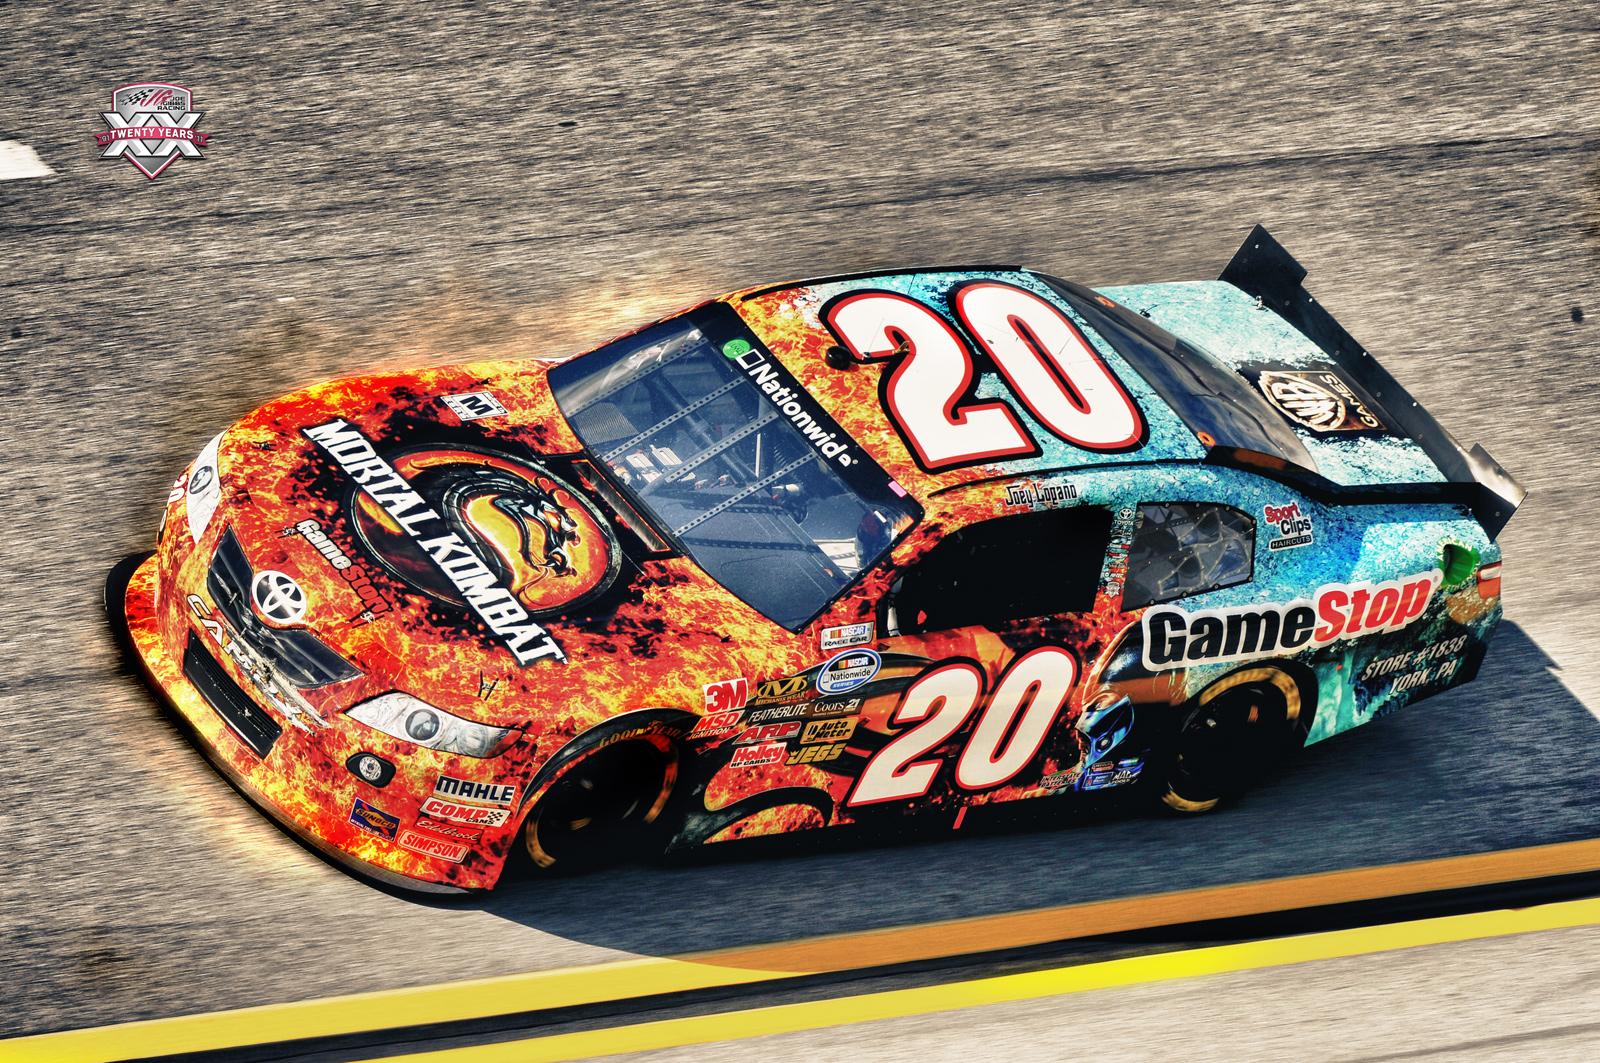 Free Nascar Wallpaper: Free NASCAR Wallpapers For Desktop